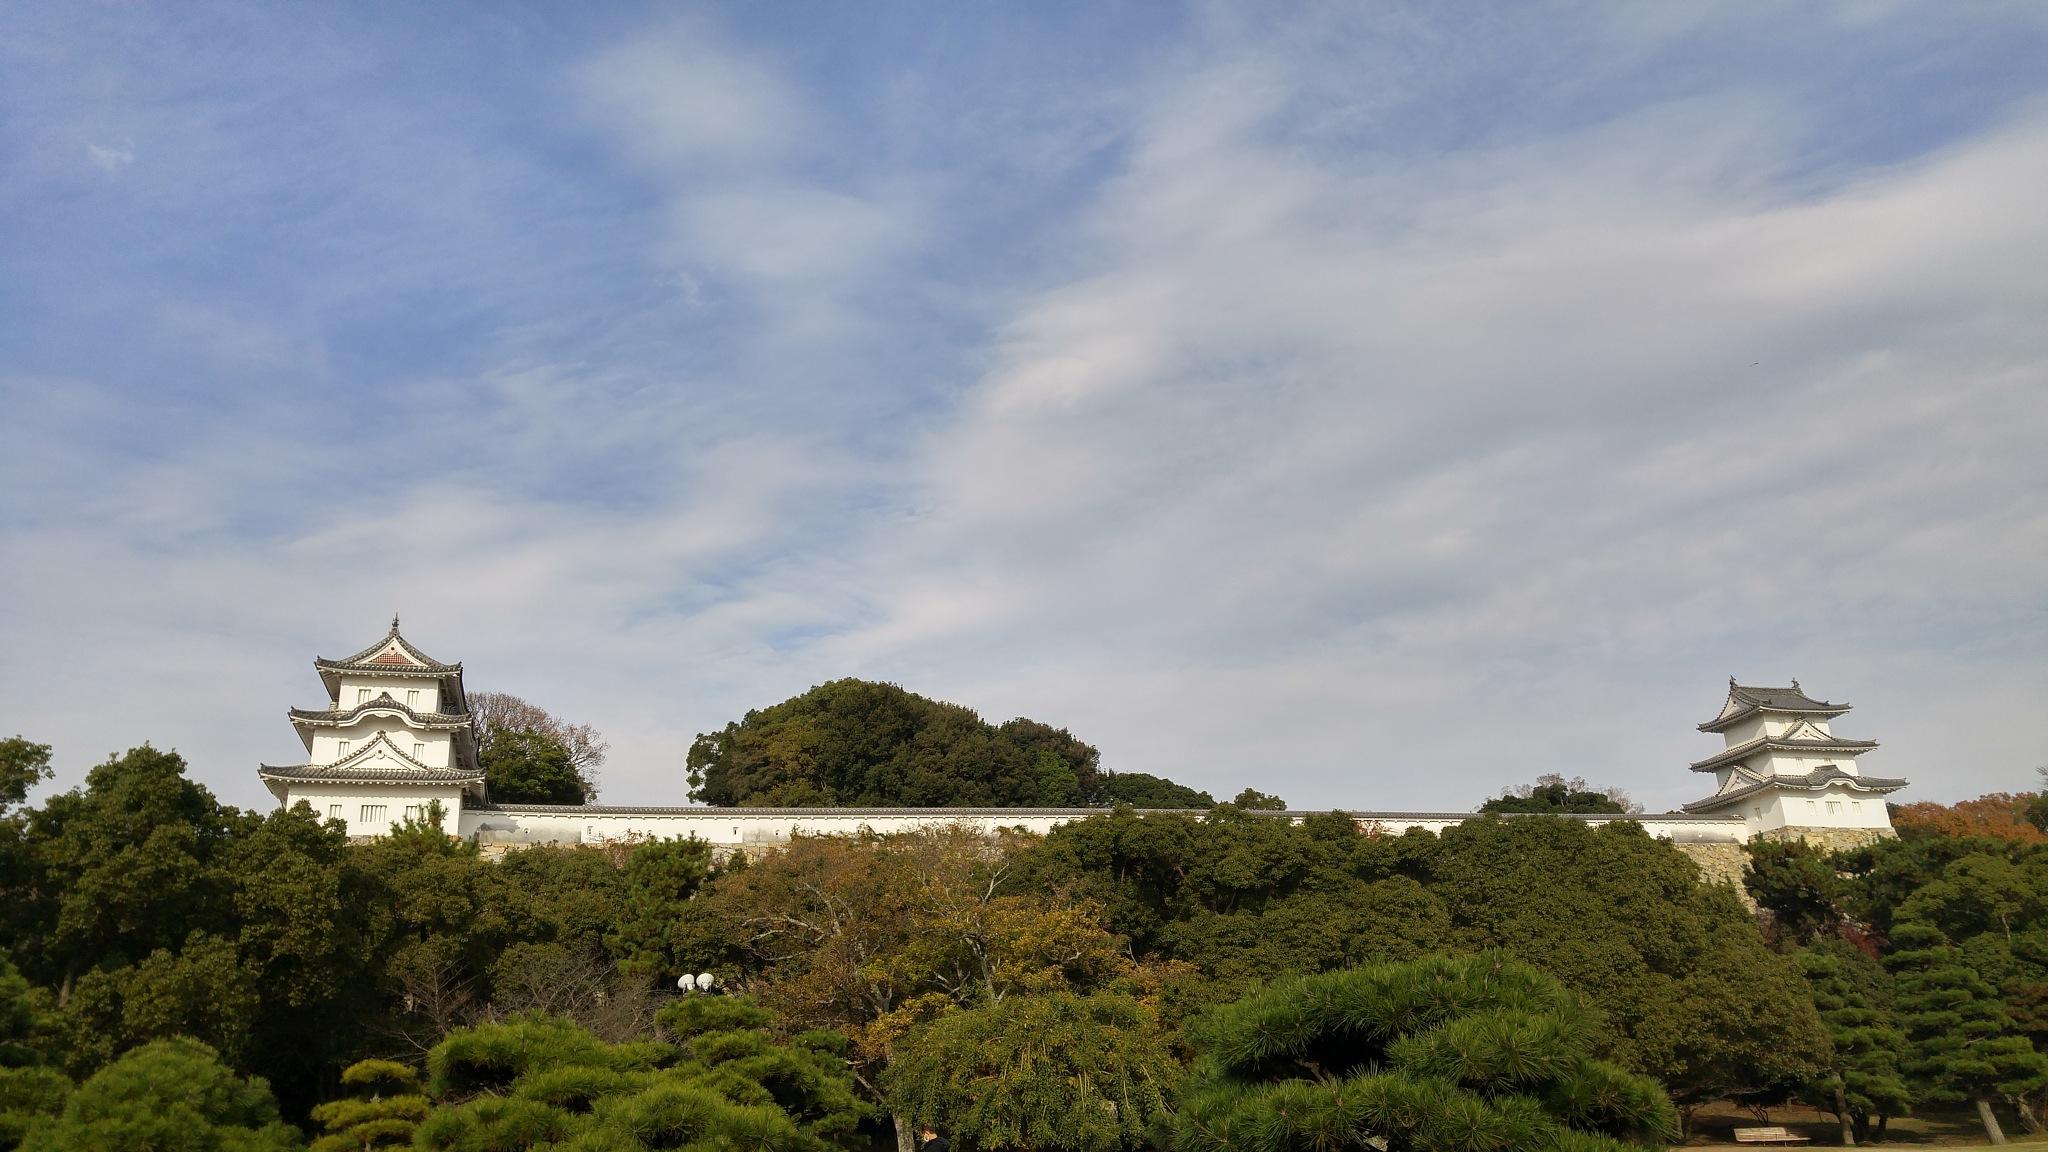 明石城 by kumikoxinye